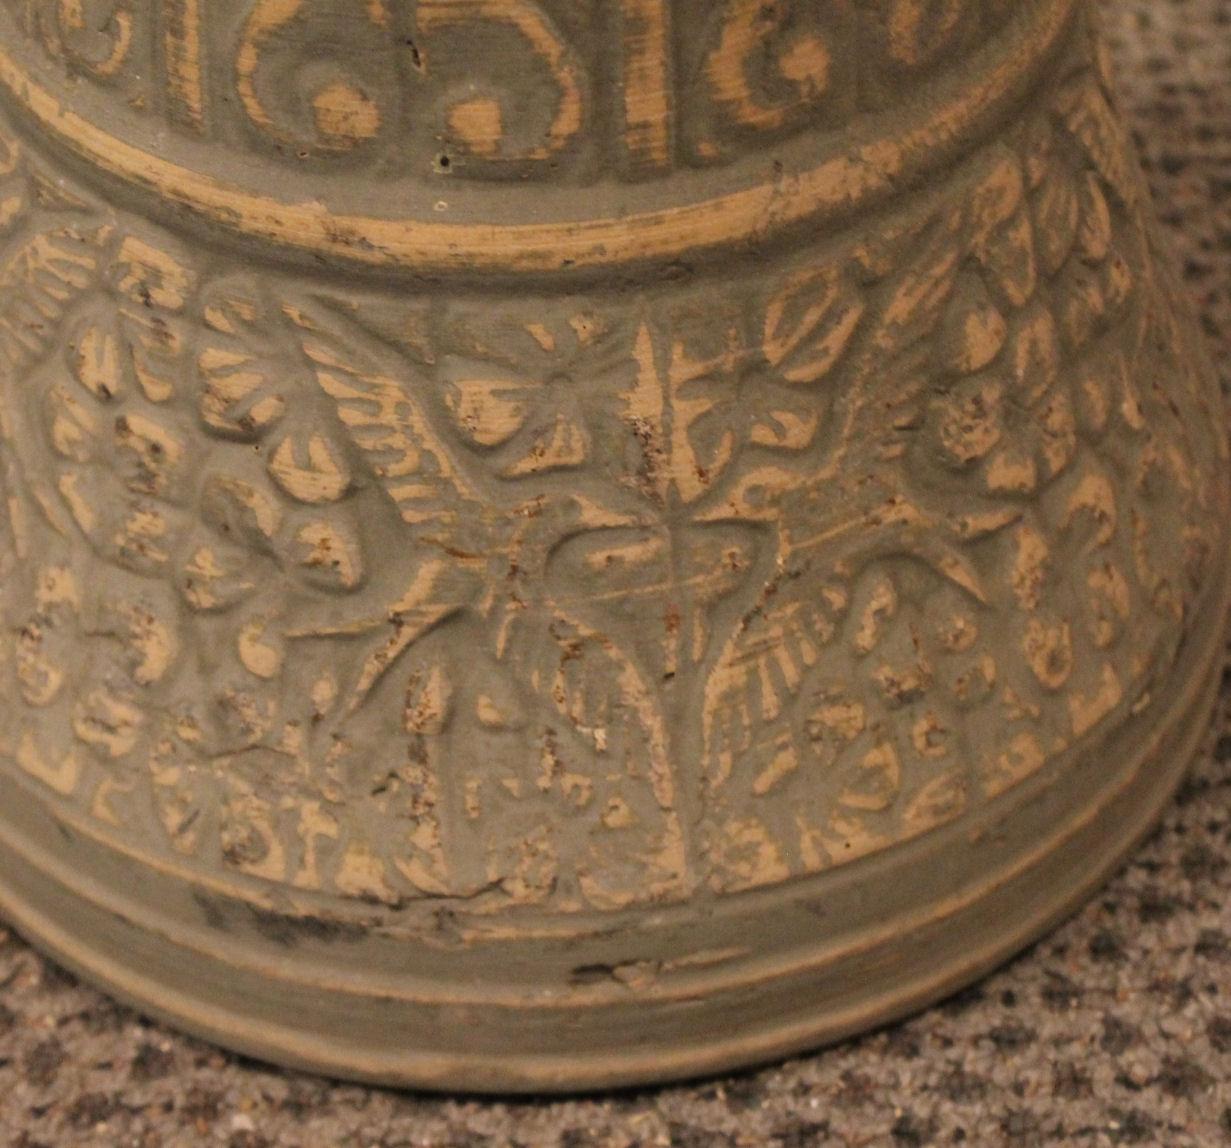 Bargain John S Antiques Antique Bird Bath Made Of Stoneware Pottery Usa Bargain John S Antiques